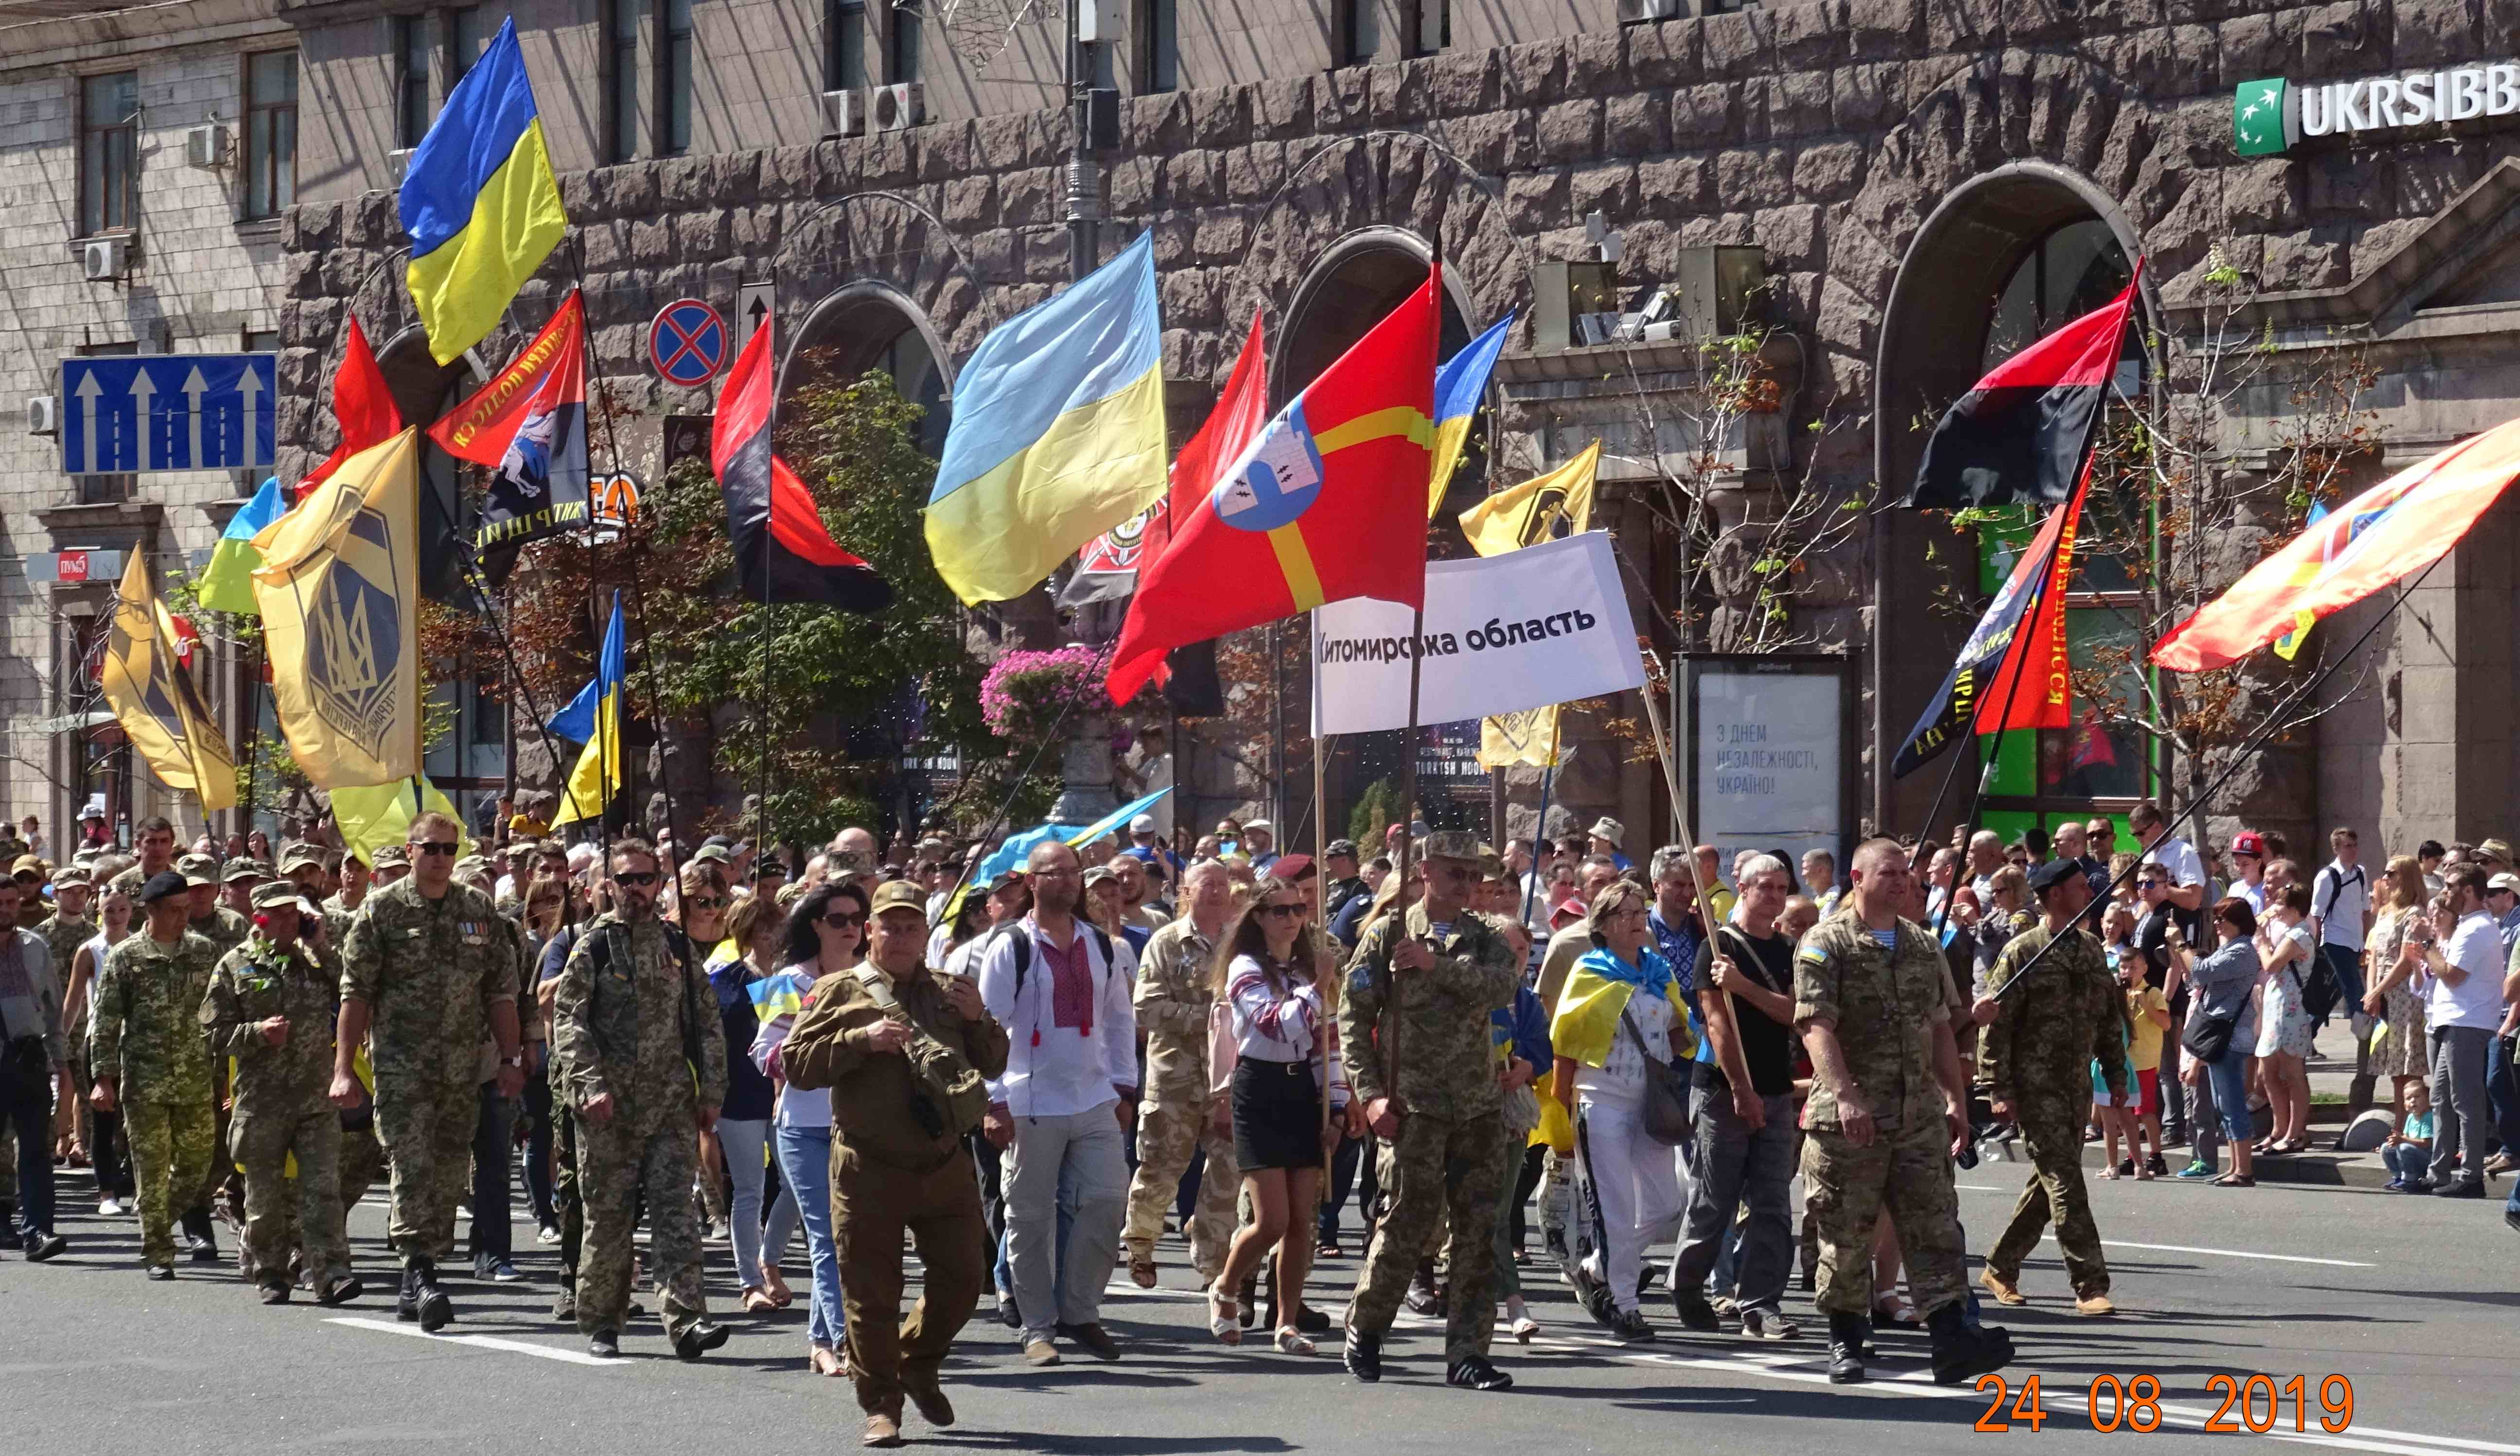 Defenders-of-Ukraine-Parad-24.Aug.19 - DSC06242.jpg